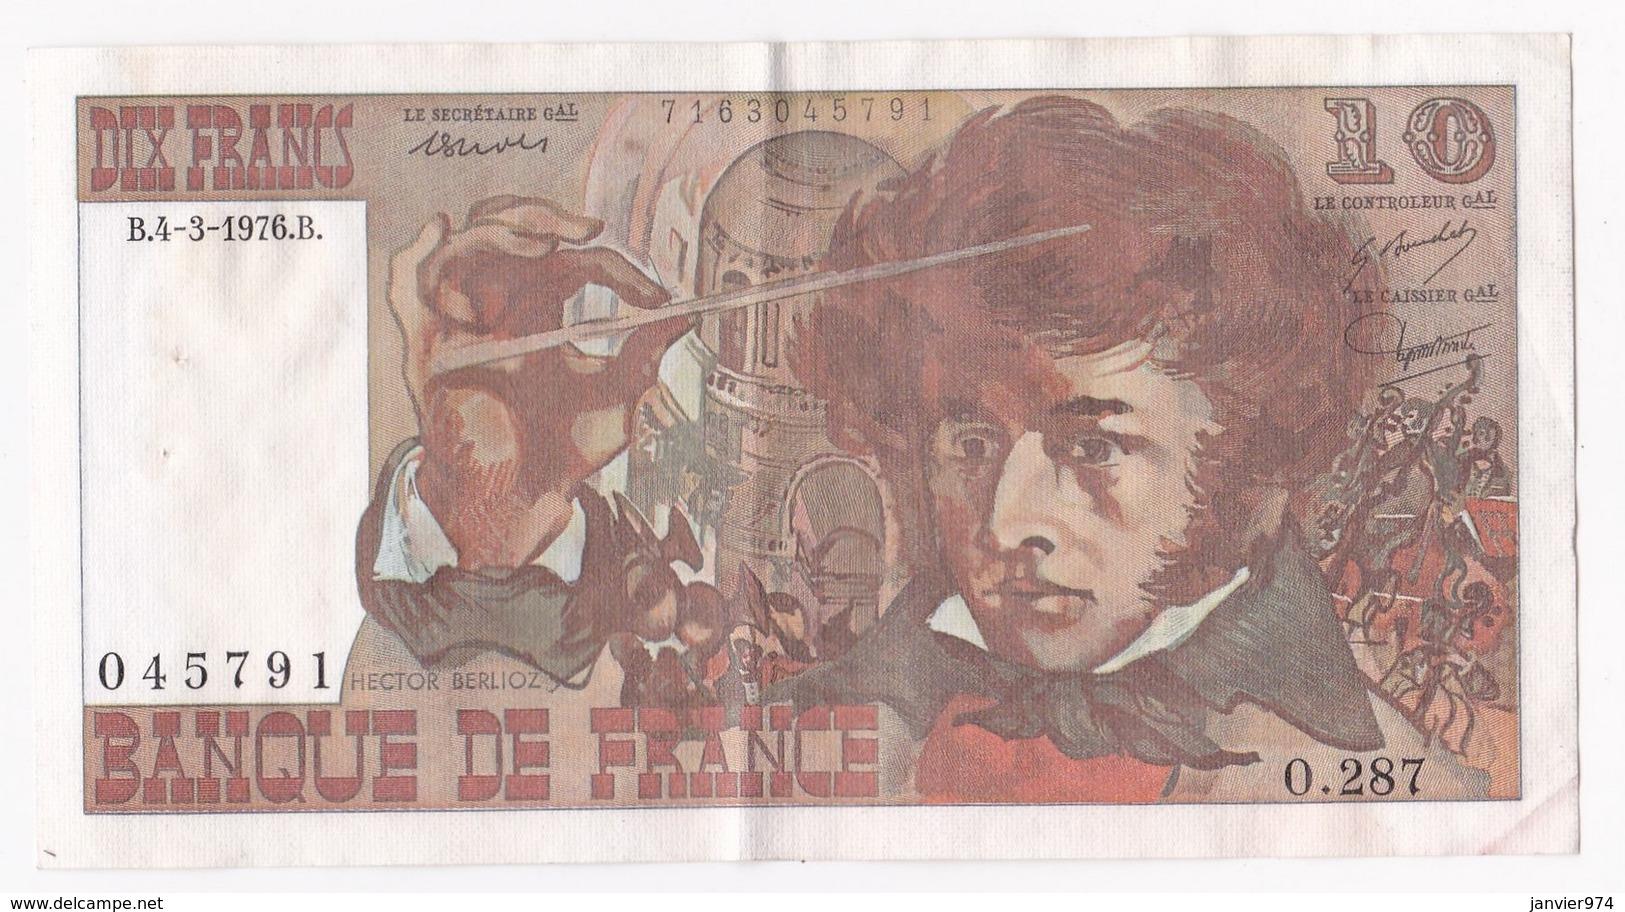 Billet 10000 (DIECIMILA) Lire Regine Del Mare 26 Gennaio 1957, Alphabet : C1179 - [ 2] 1946-… : République